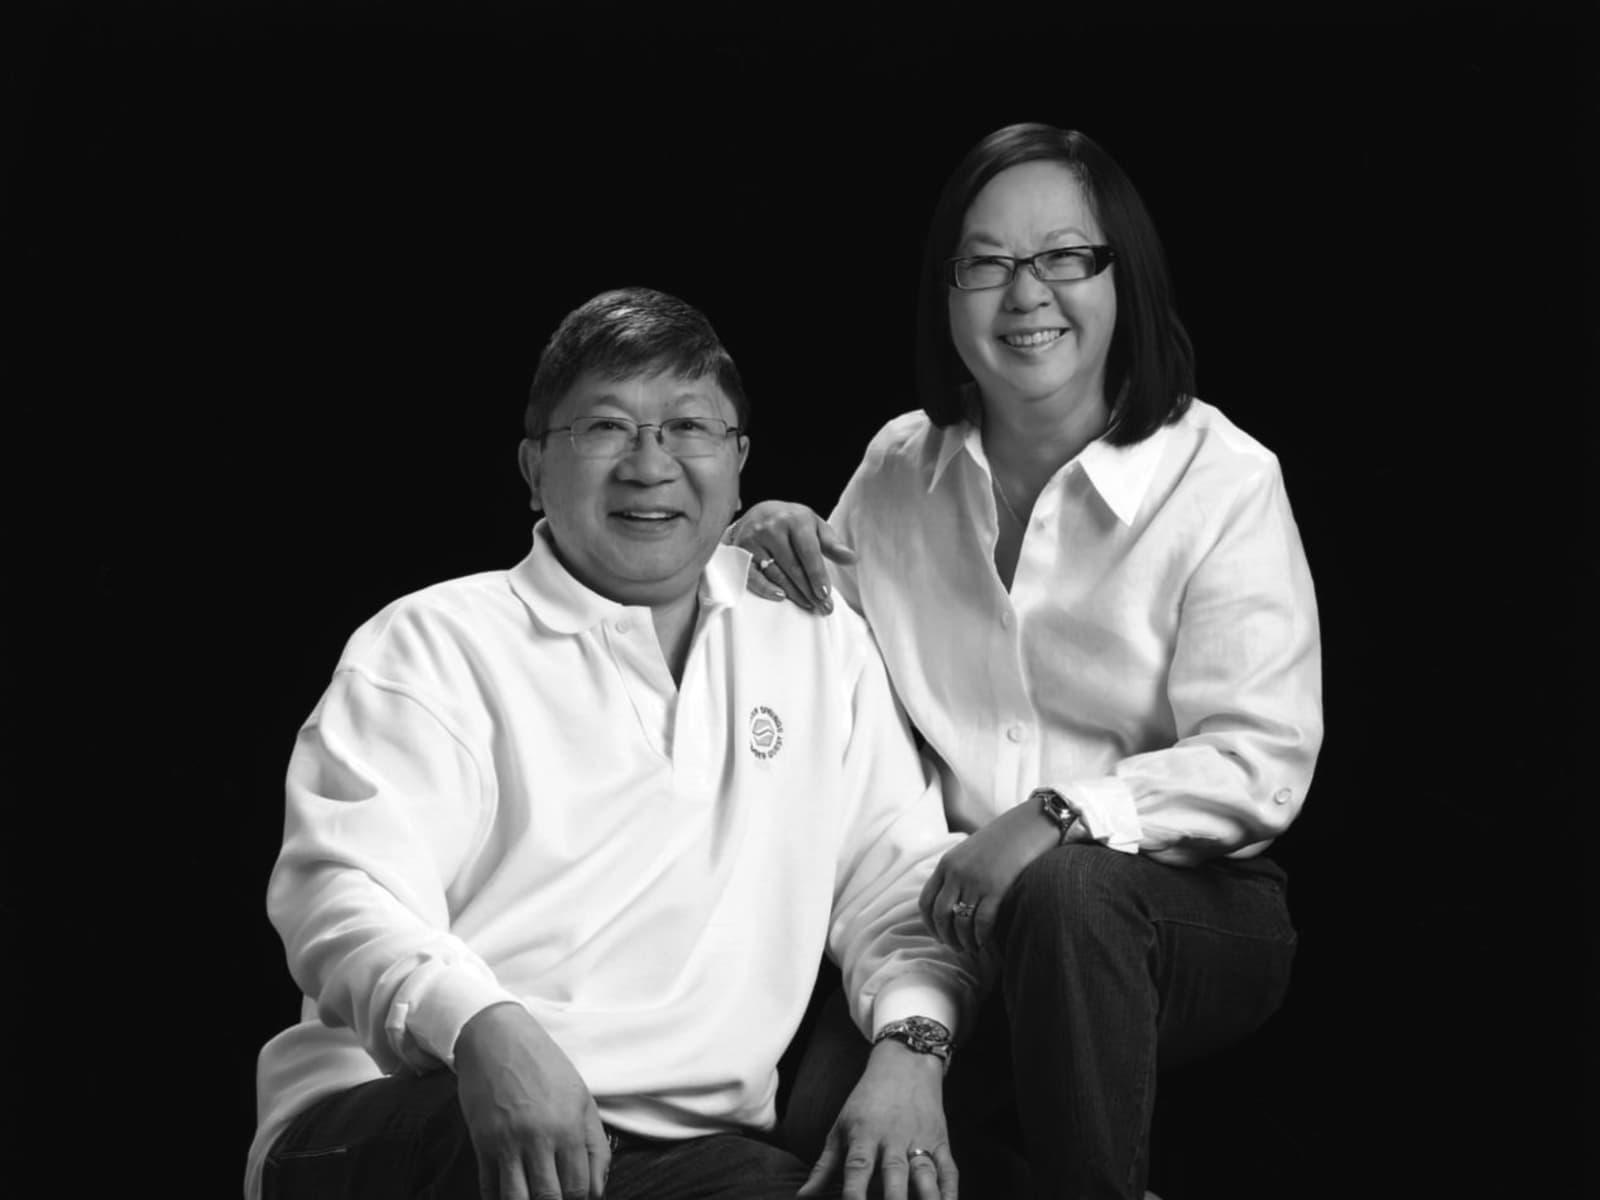 Michael & Donna from Calgary, Alberta, Canada